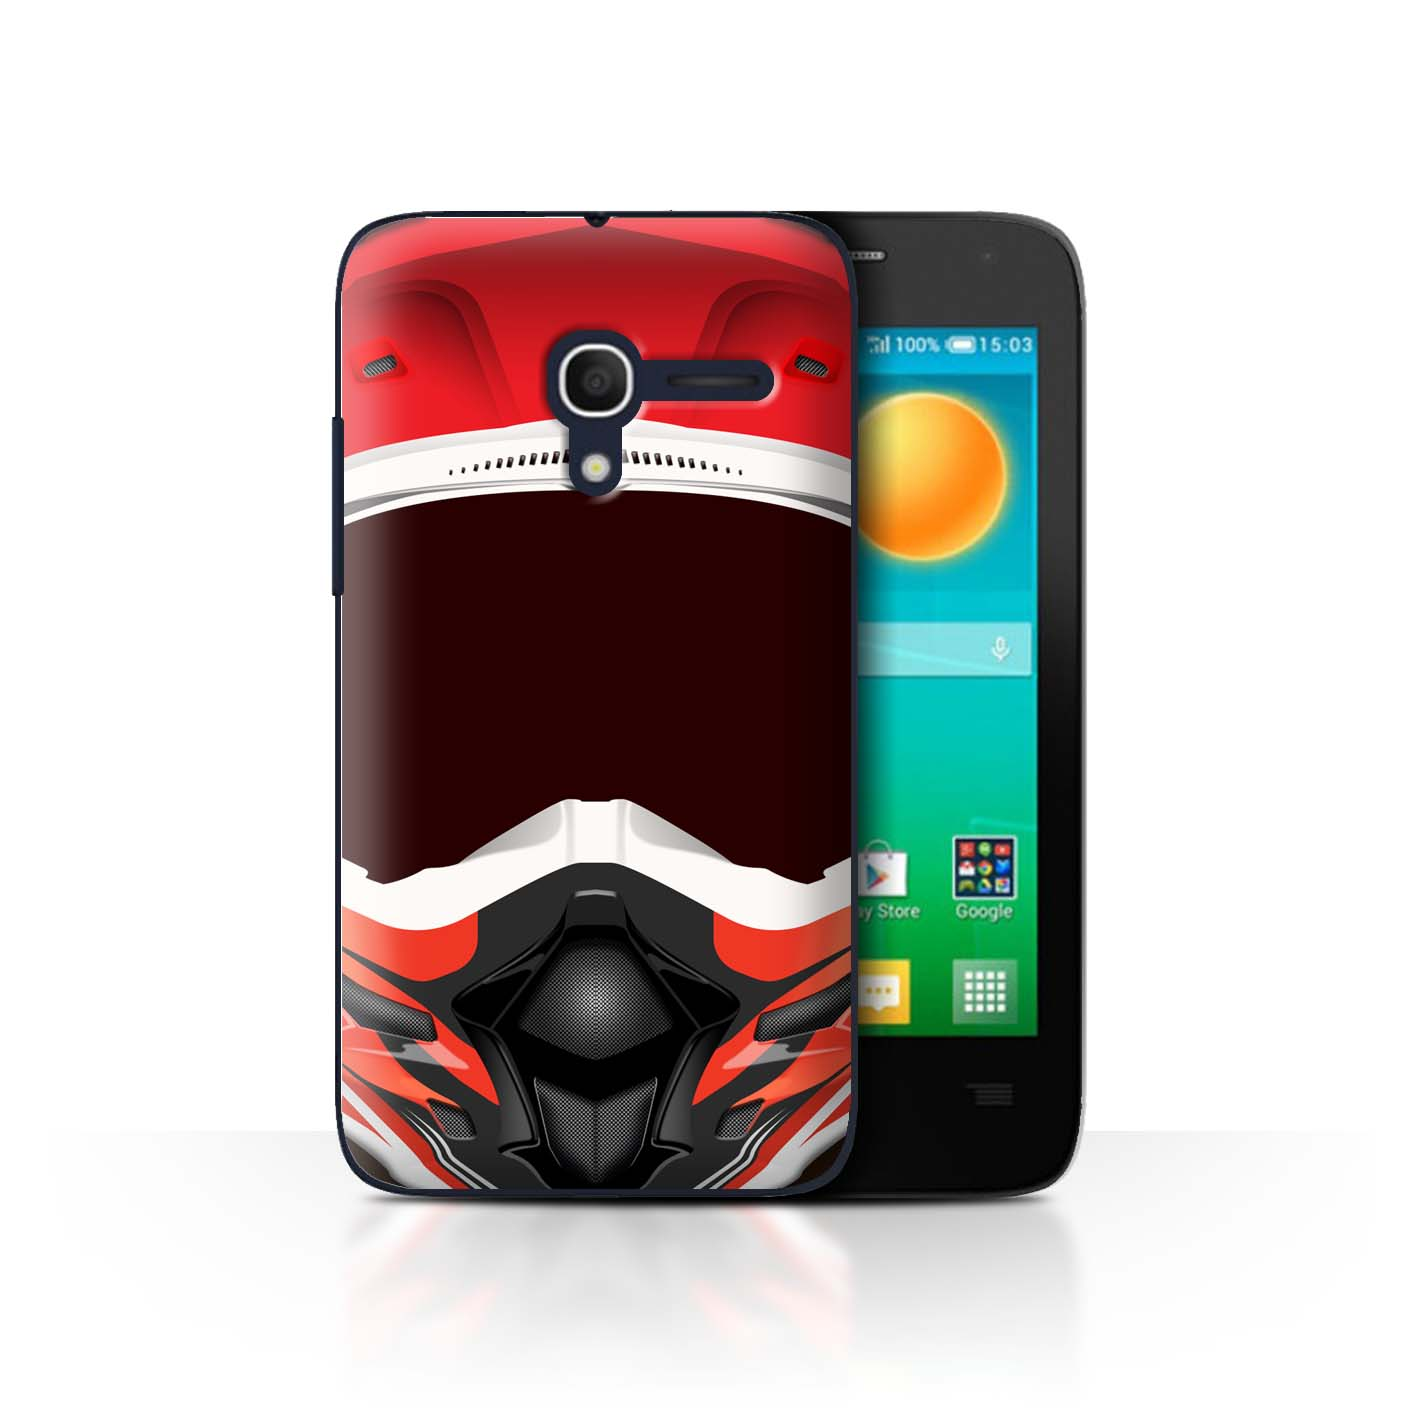 STUFF4-Back-Case-Cover-Skin-for-Alcatel-Pop-D3-Motorcycle-Helmet